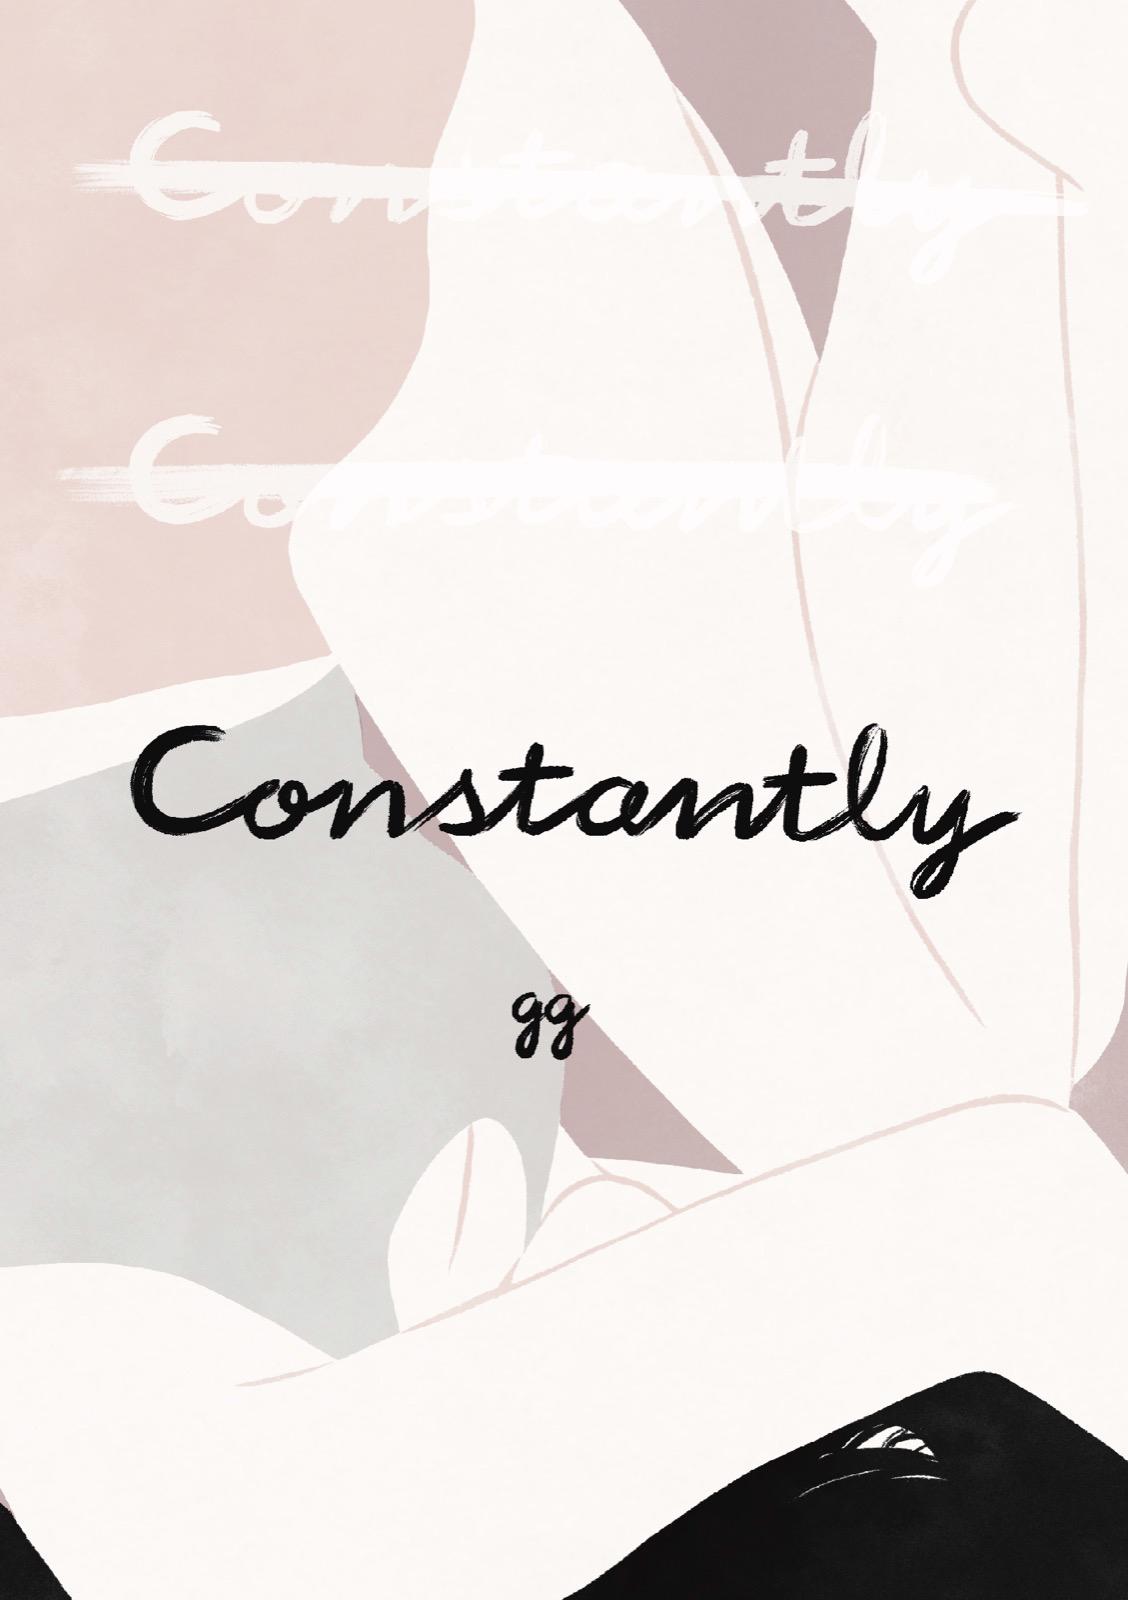 Constantly by GG (Koyama Press)